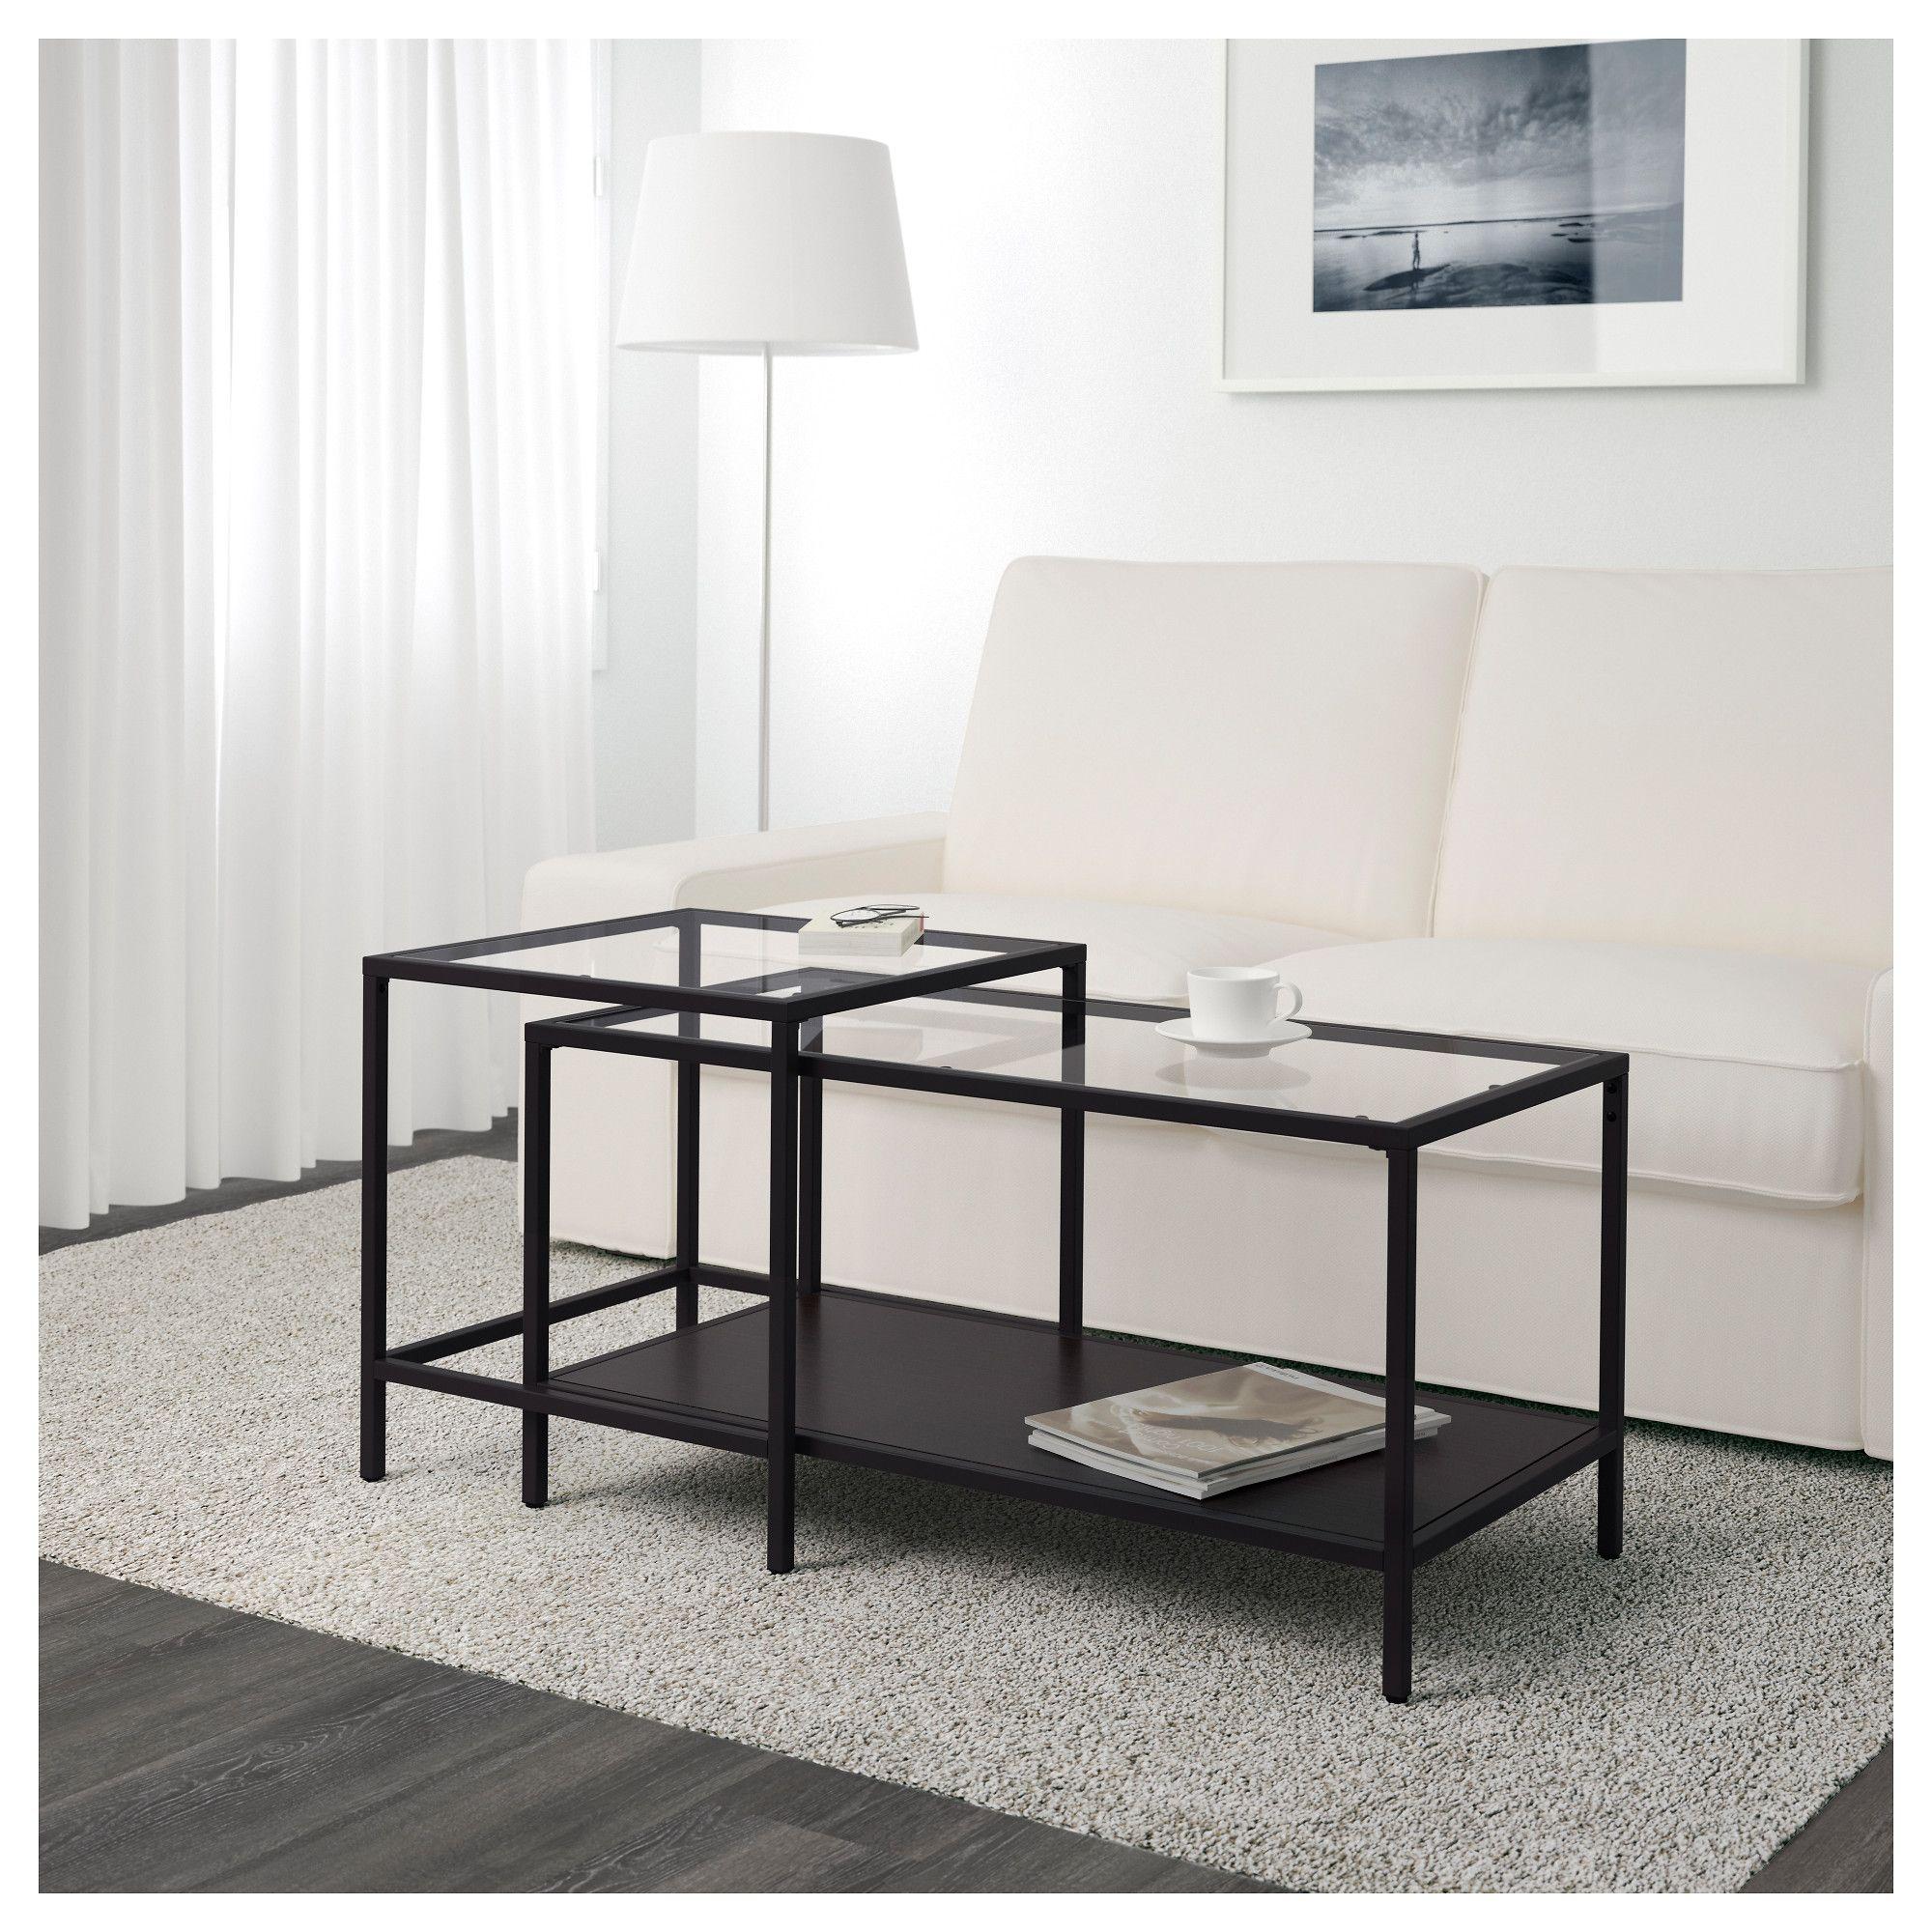 Ikea Us Furniture And Home Furnishings Ikea Coffee Table Coffee Table Ikea Glass Coffee Table